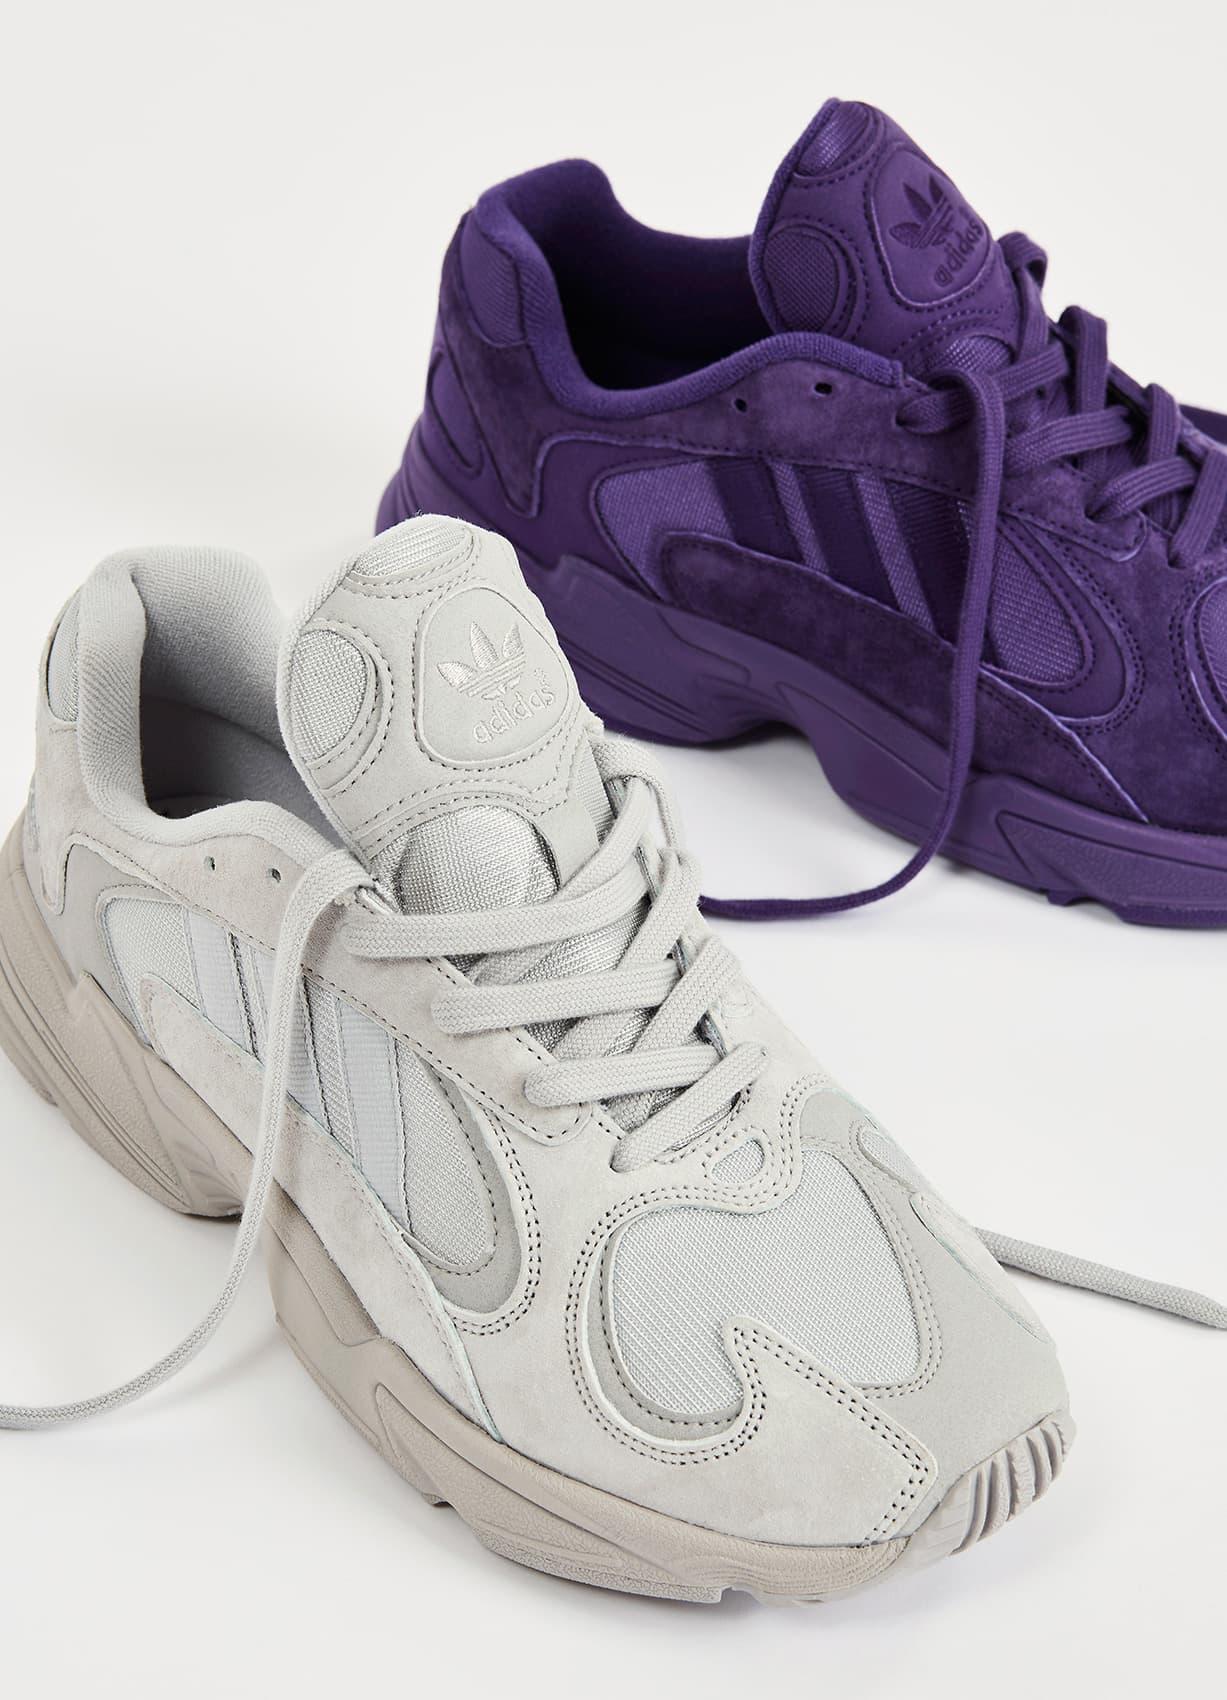 Sneakersnstuff X Adidas Yung 1 George Clinton Hypebeast